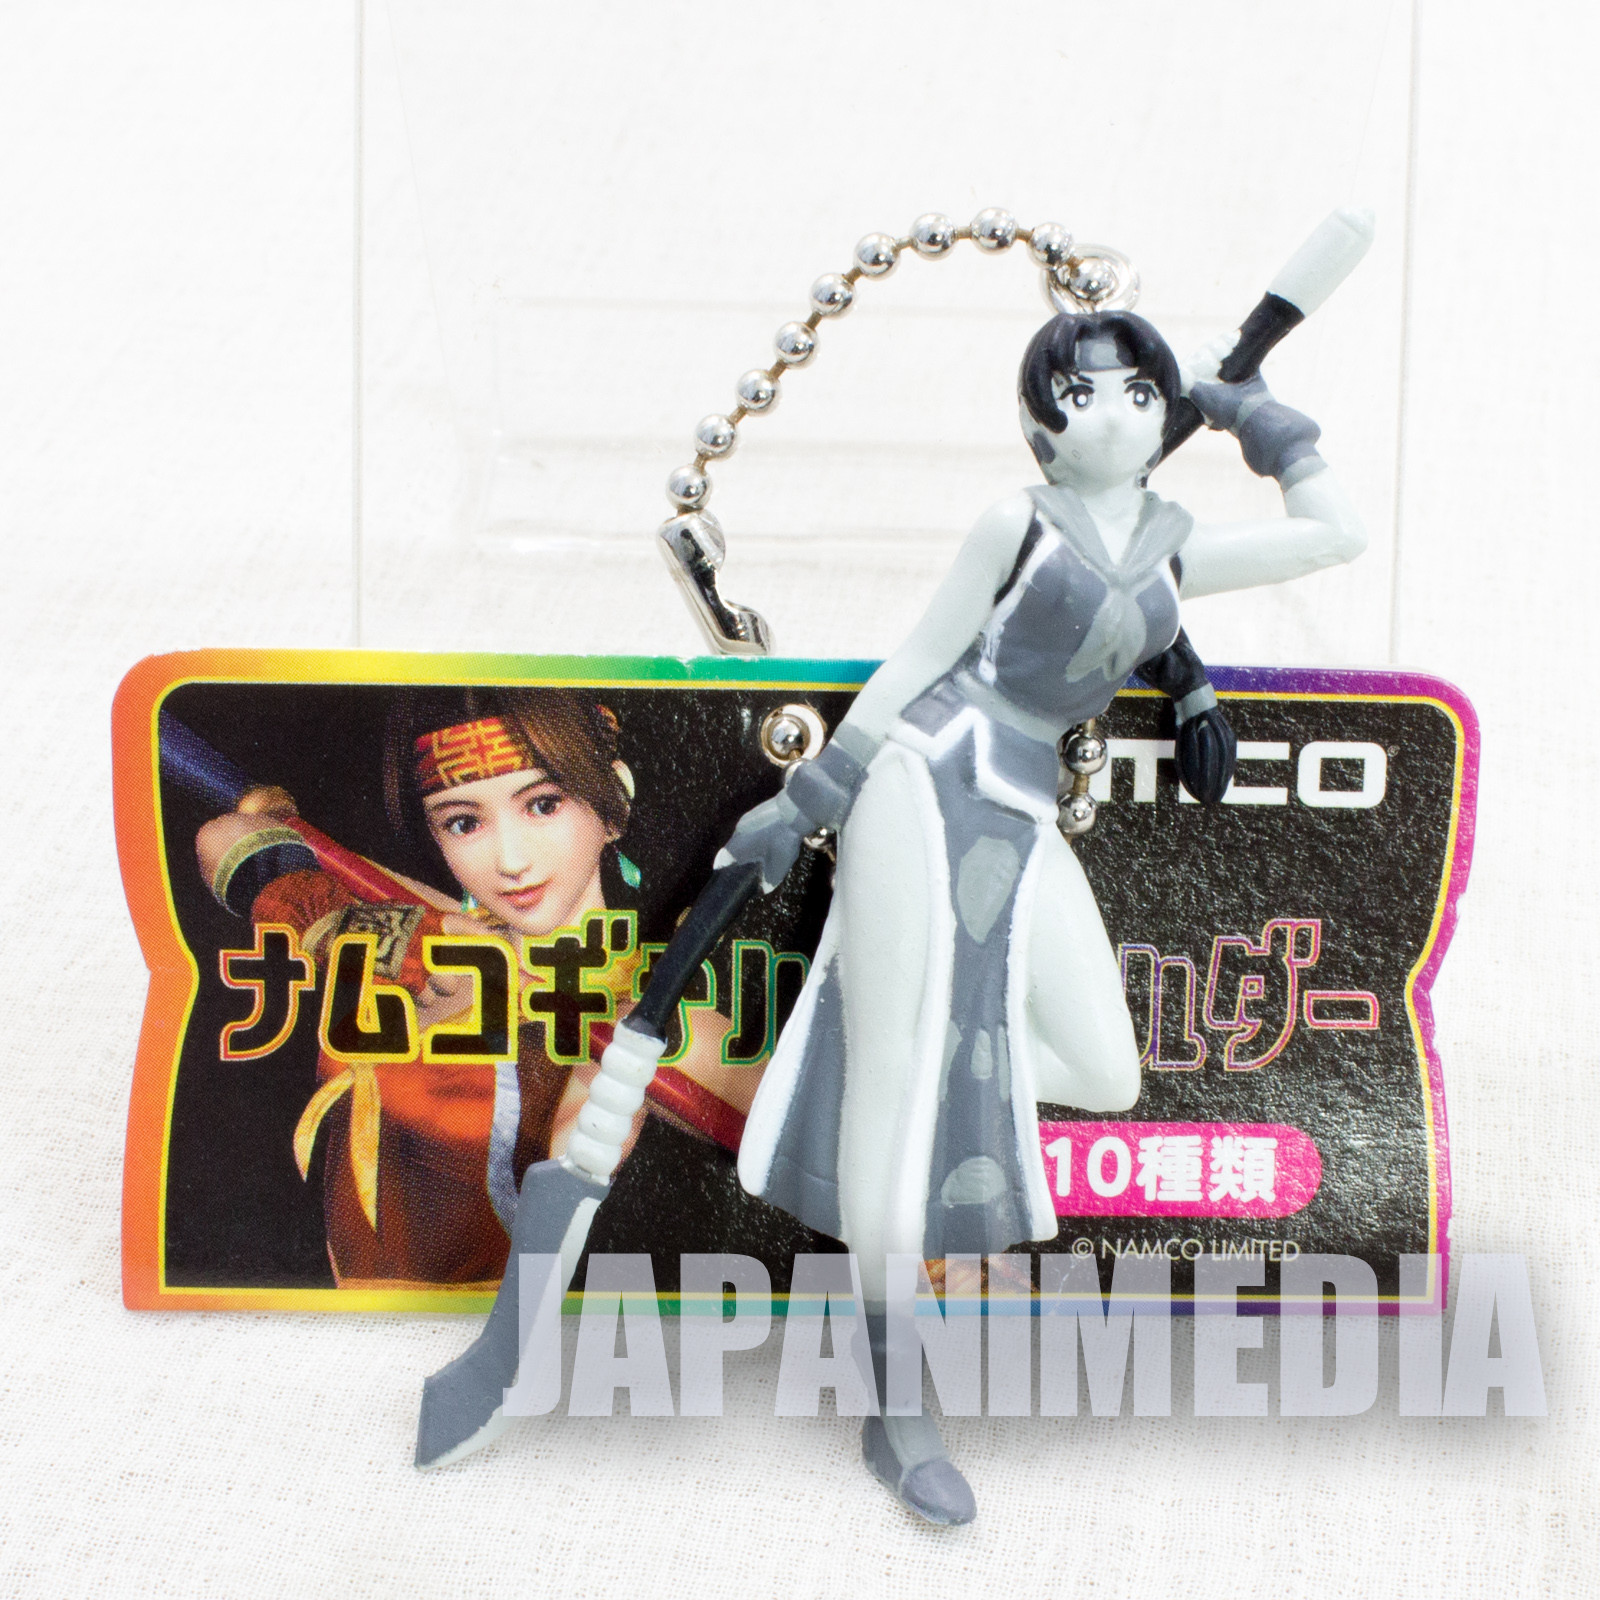 Retro Rare! Soul Calibur Seong Mi-na Monochrome Figure Ballchain Namco JAPAN